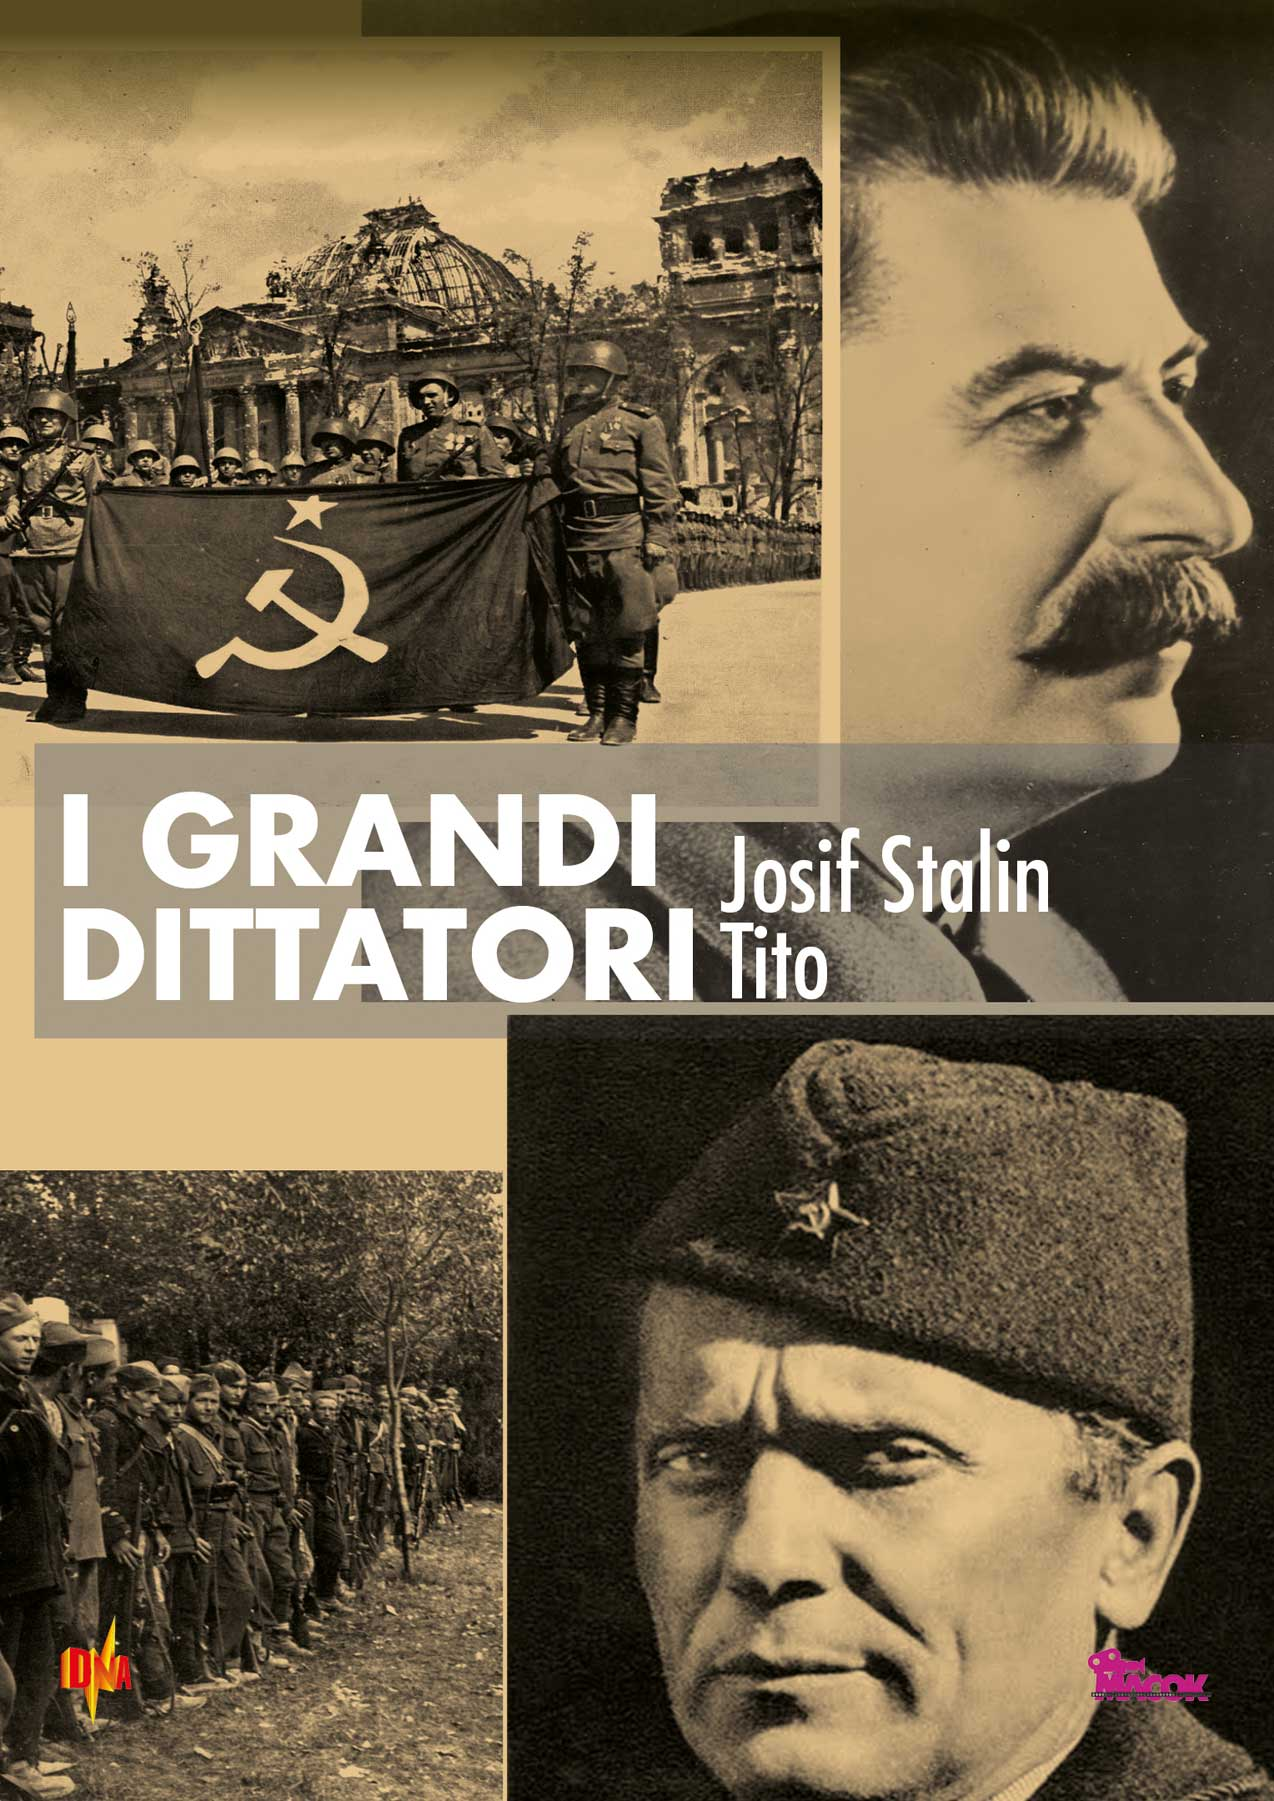 I GRANDI DITTATORI - STALIN / TITO (DVD)